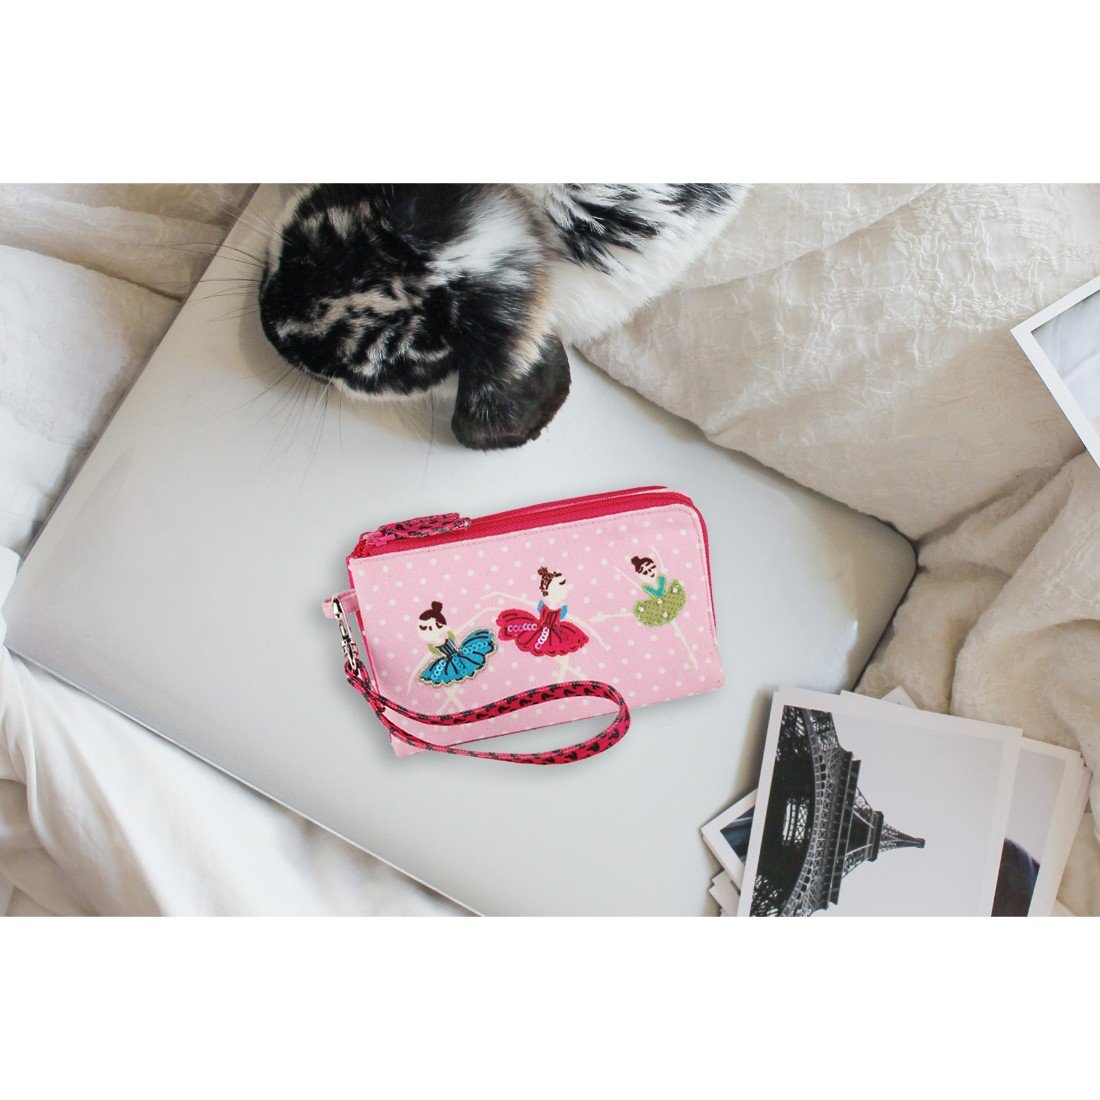 Wristlet removable clutch travel bag purse money pouch wallet organizer by Pinaken (Image #2)